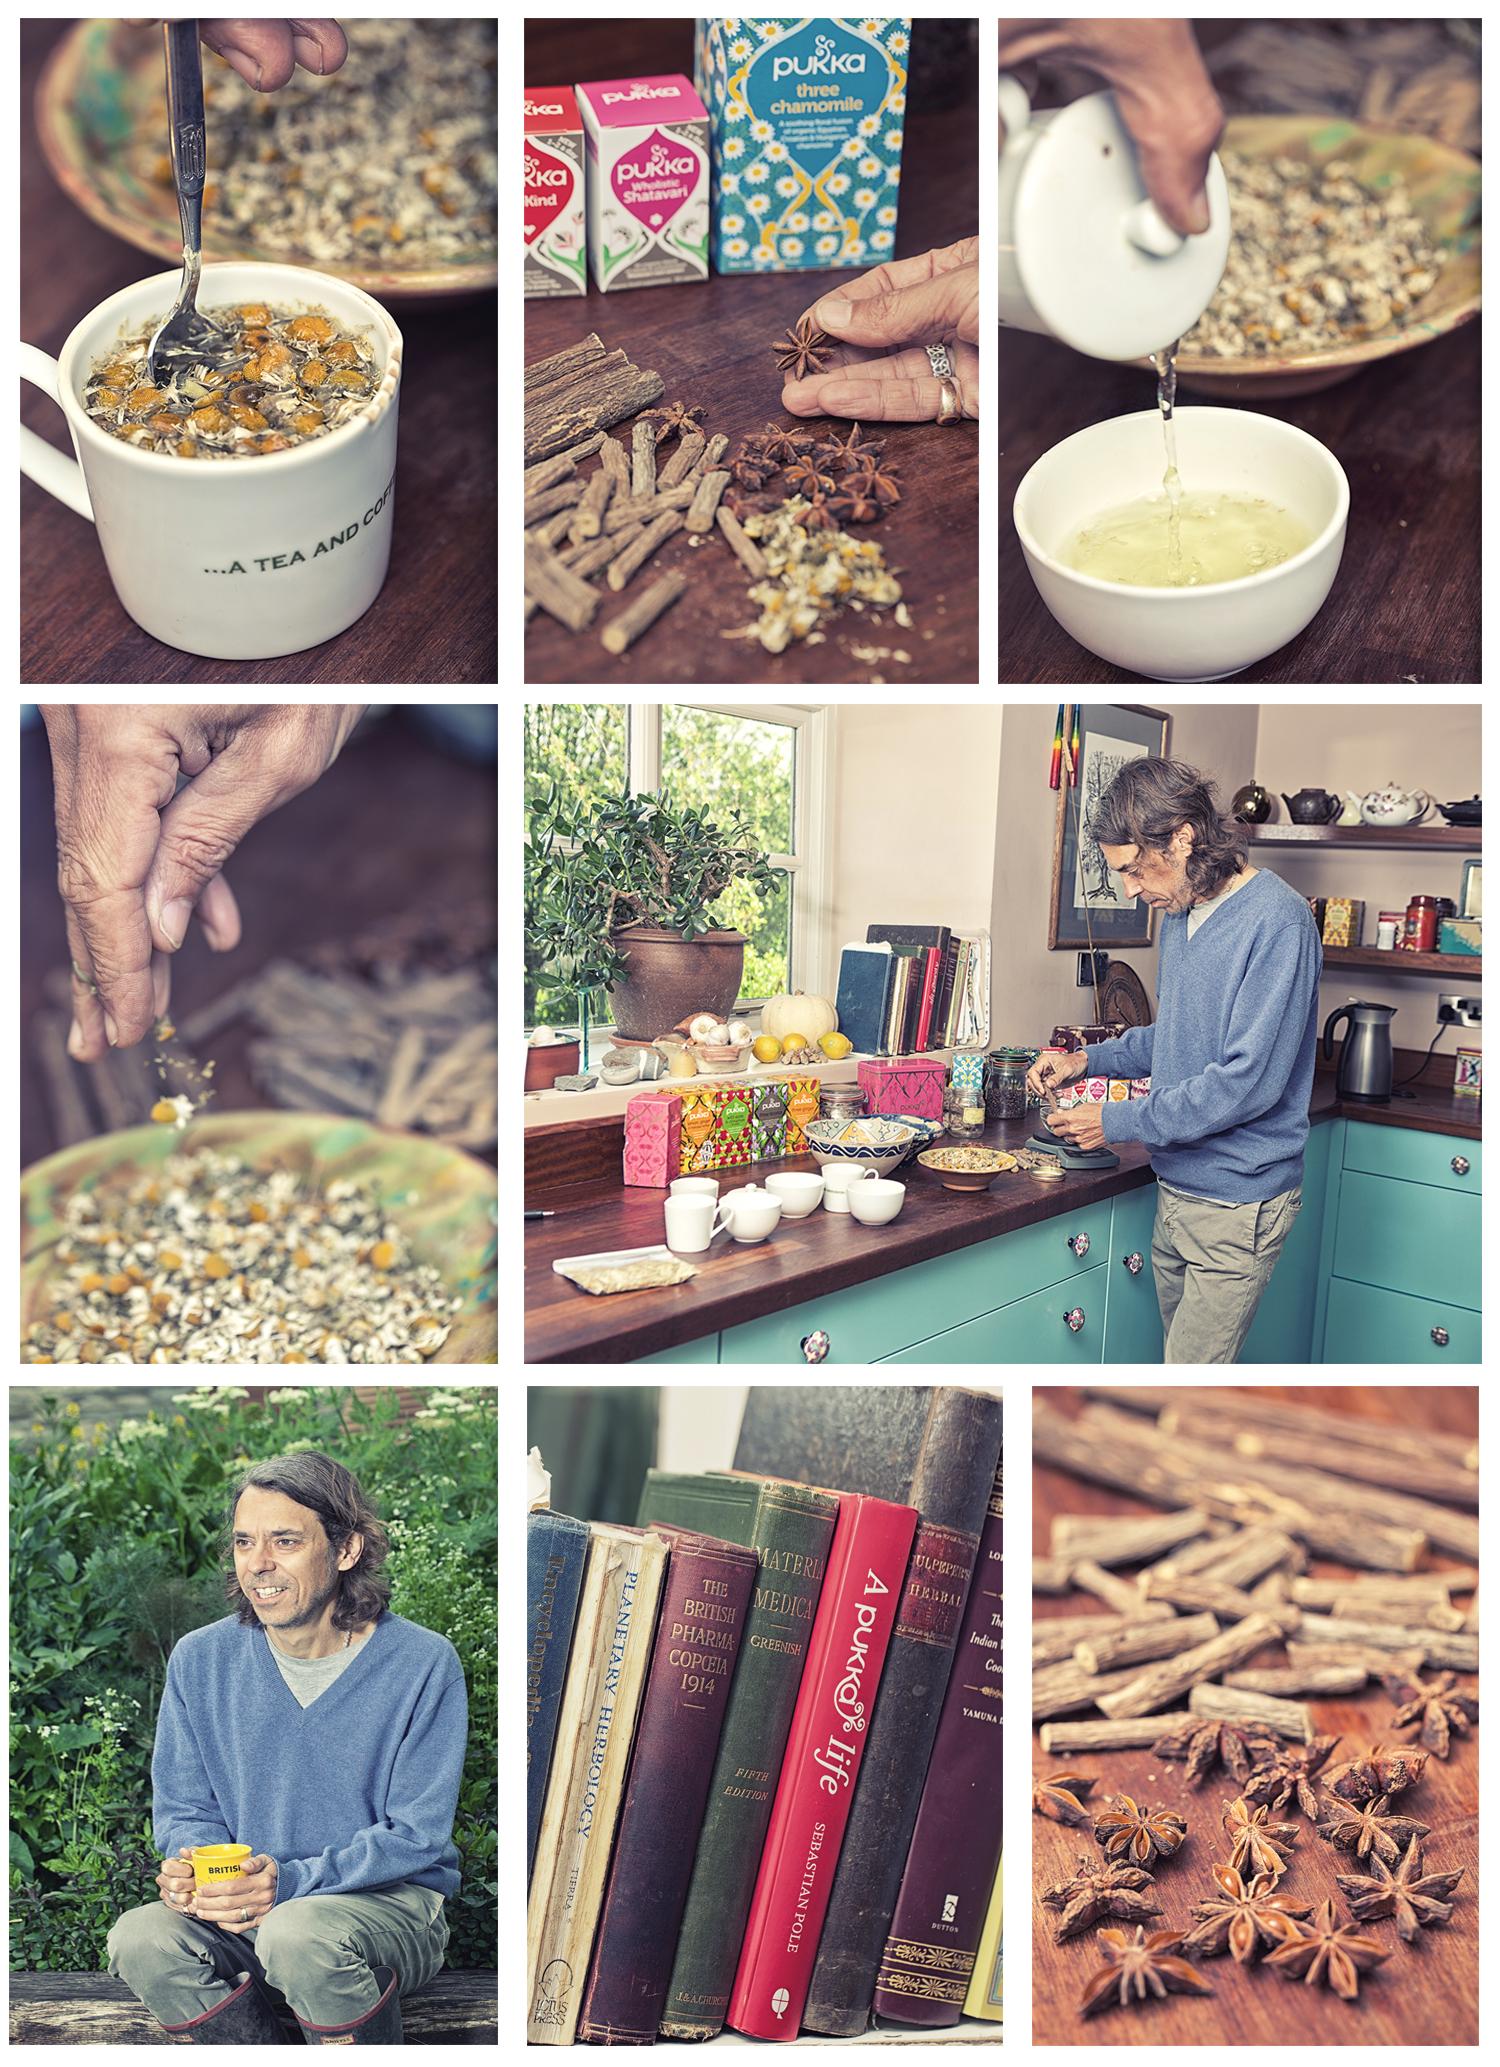 Sebastian Pole, concocting new tea recipes